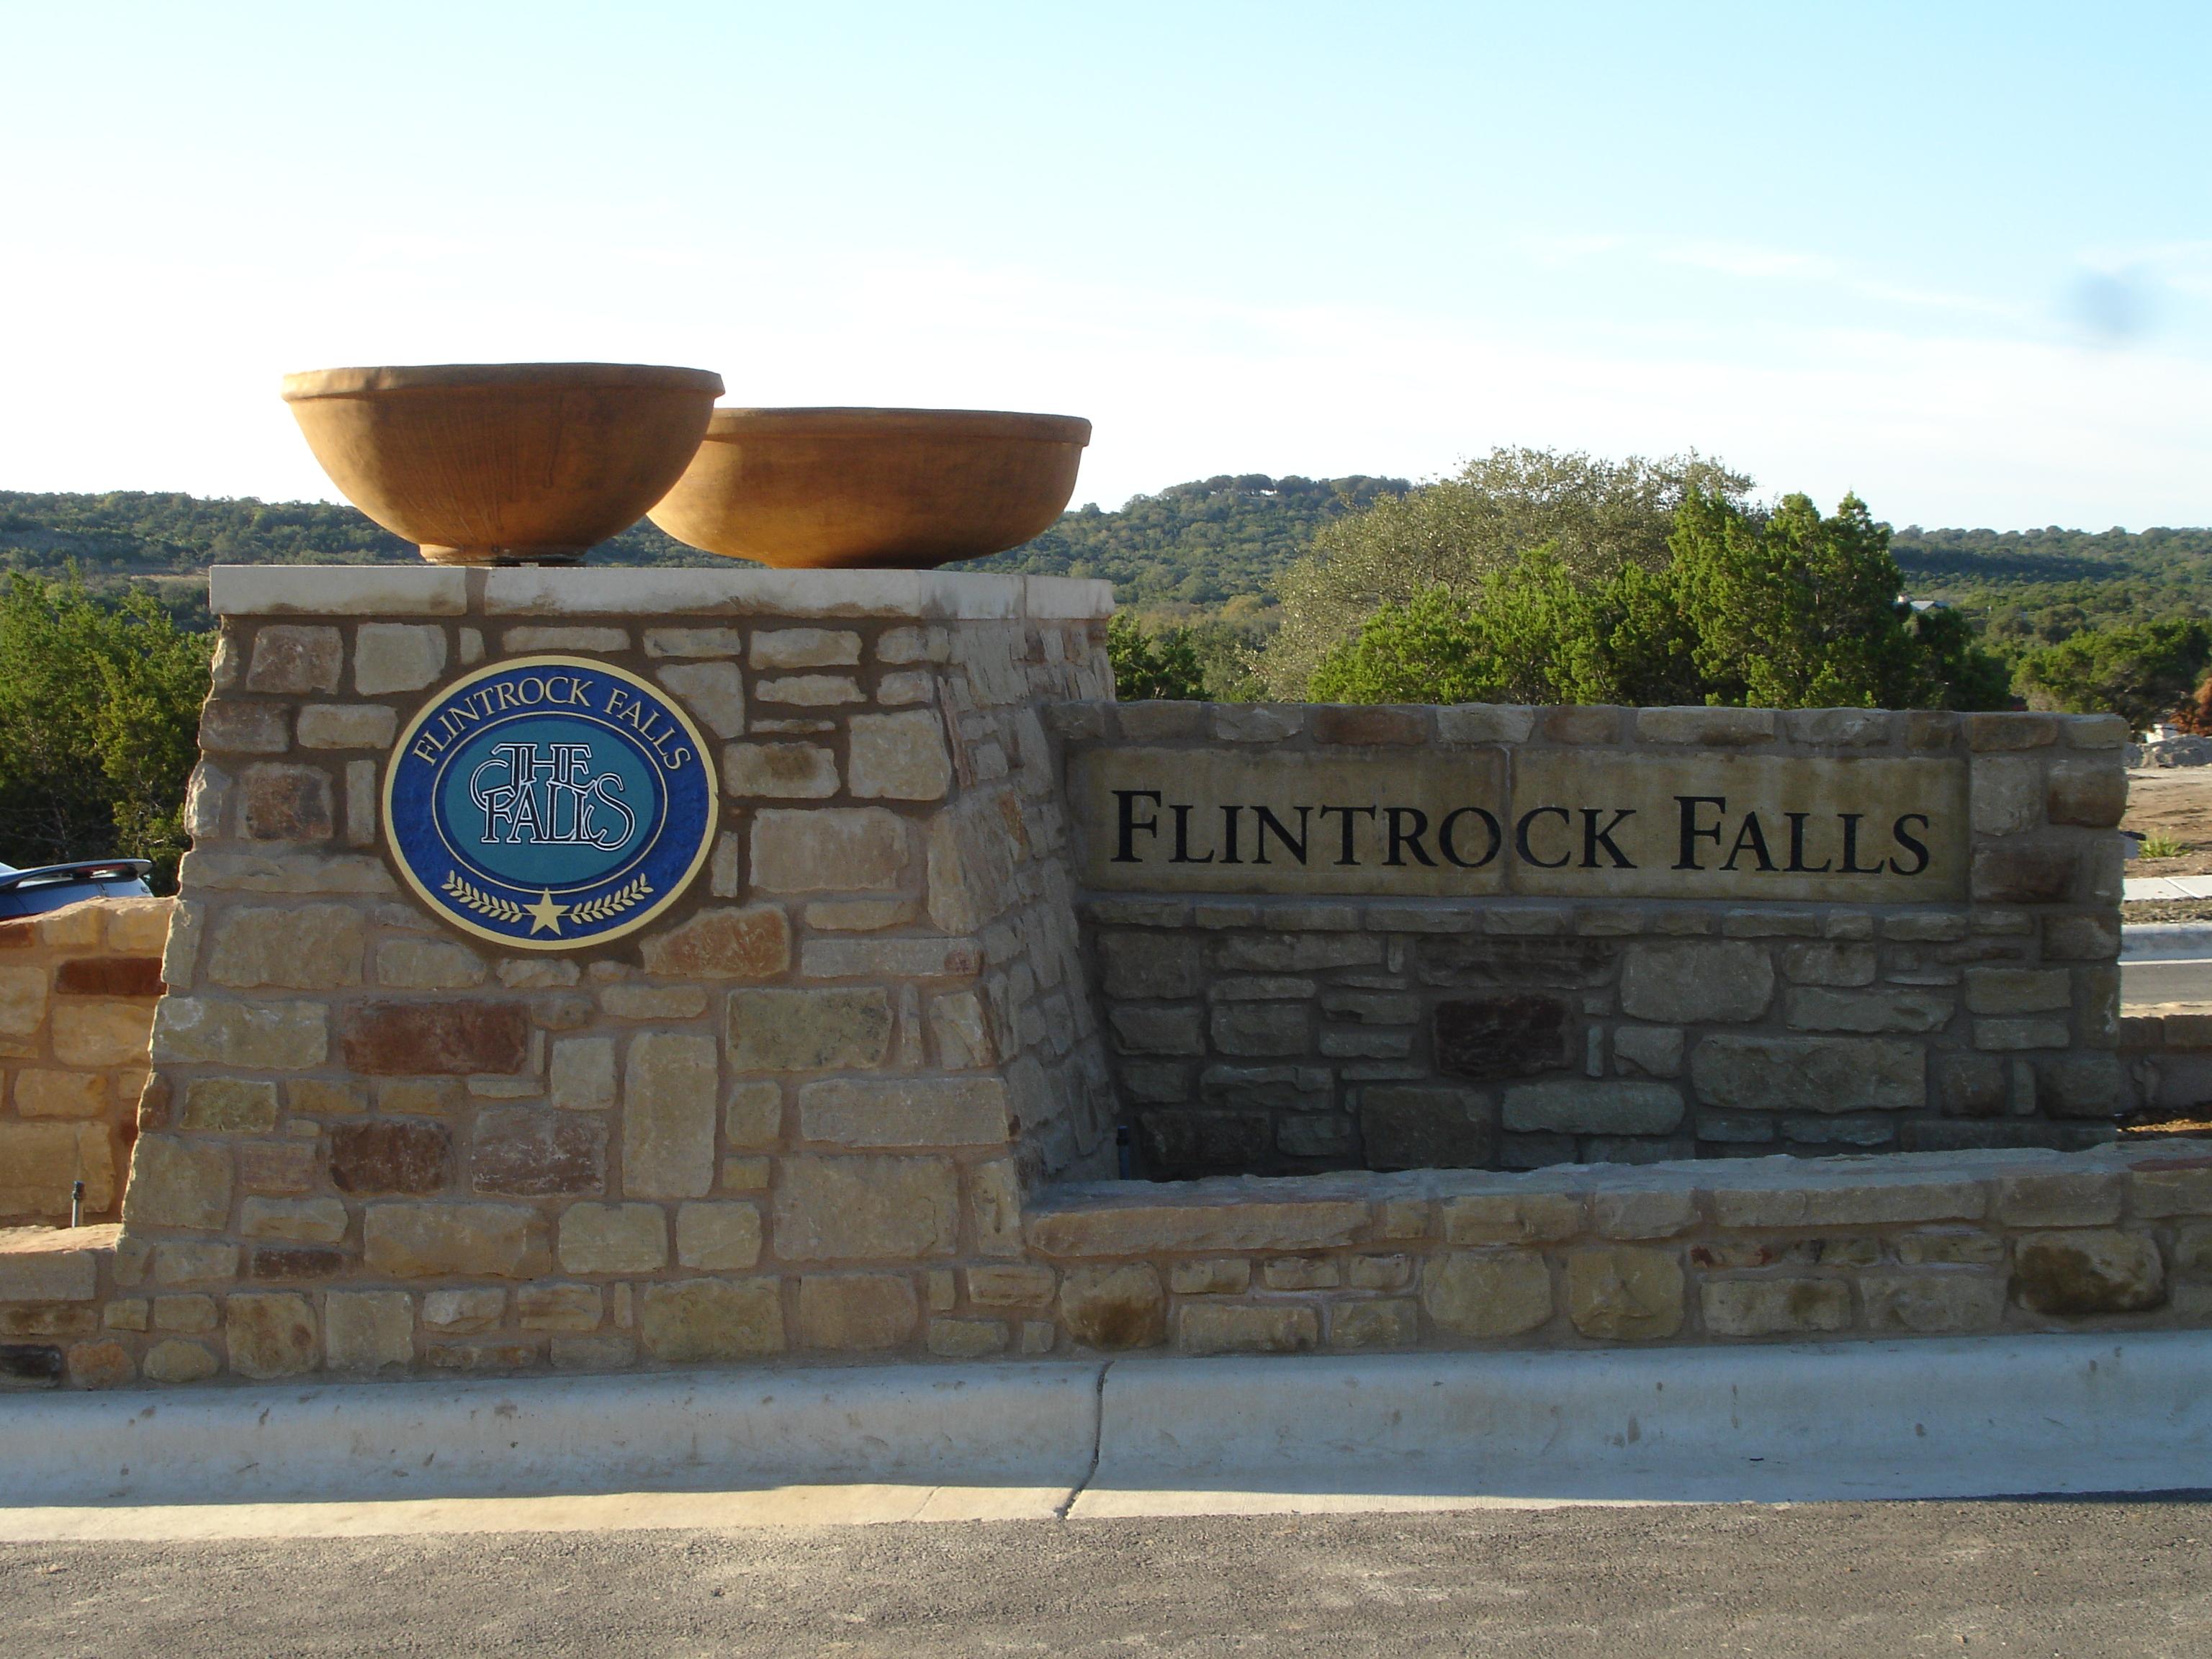 Flintrock Falls Entry Monument